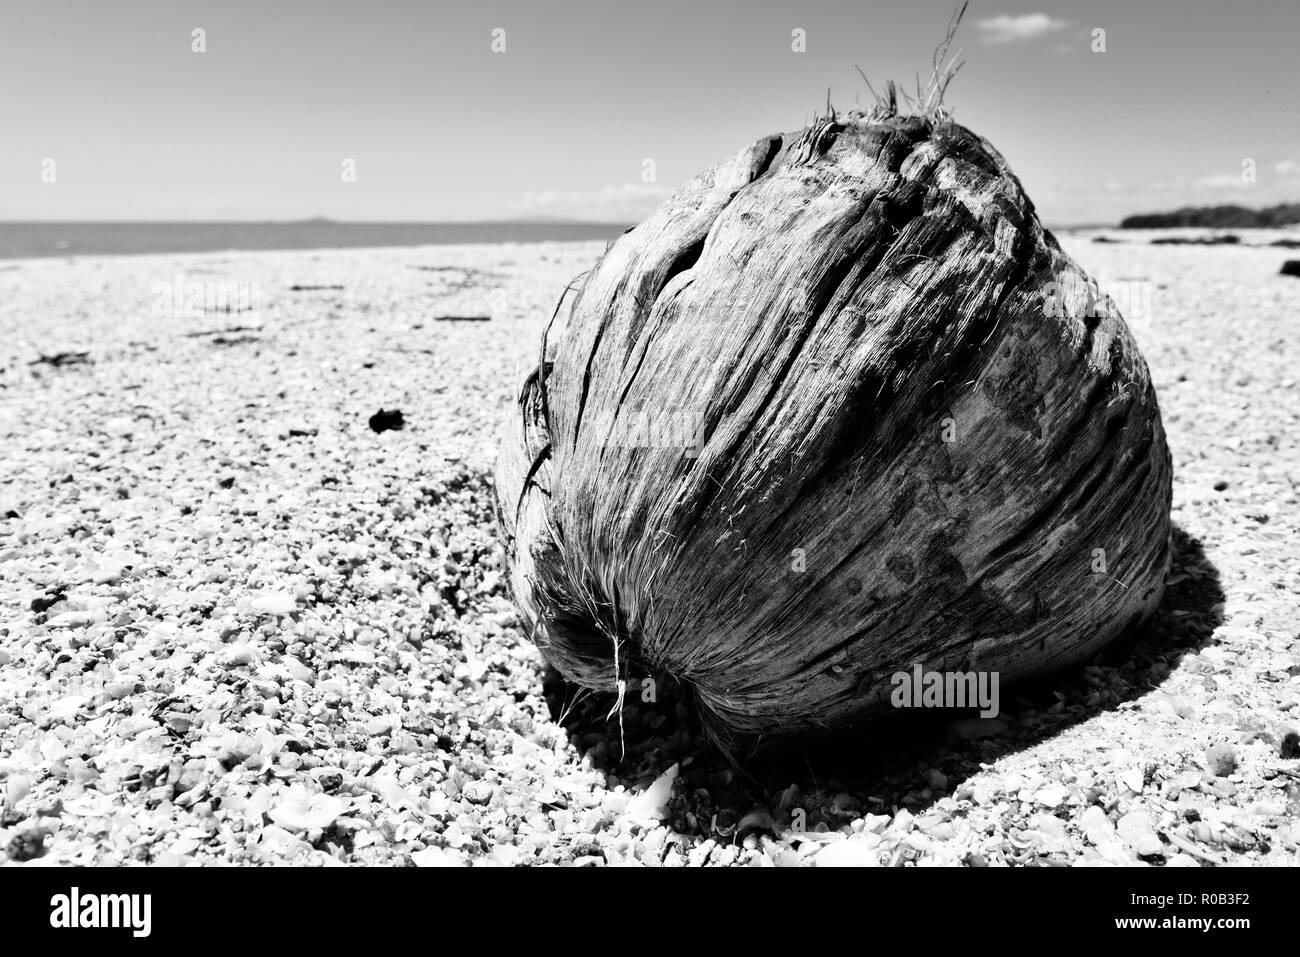 A coconut on a deserted tropical beach, Balgal beach, QLD, Australia - Stock Image